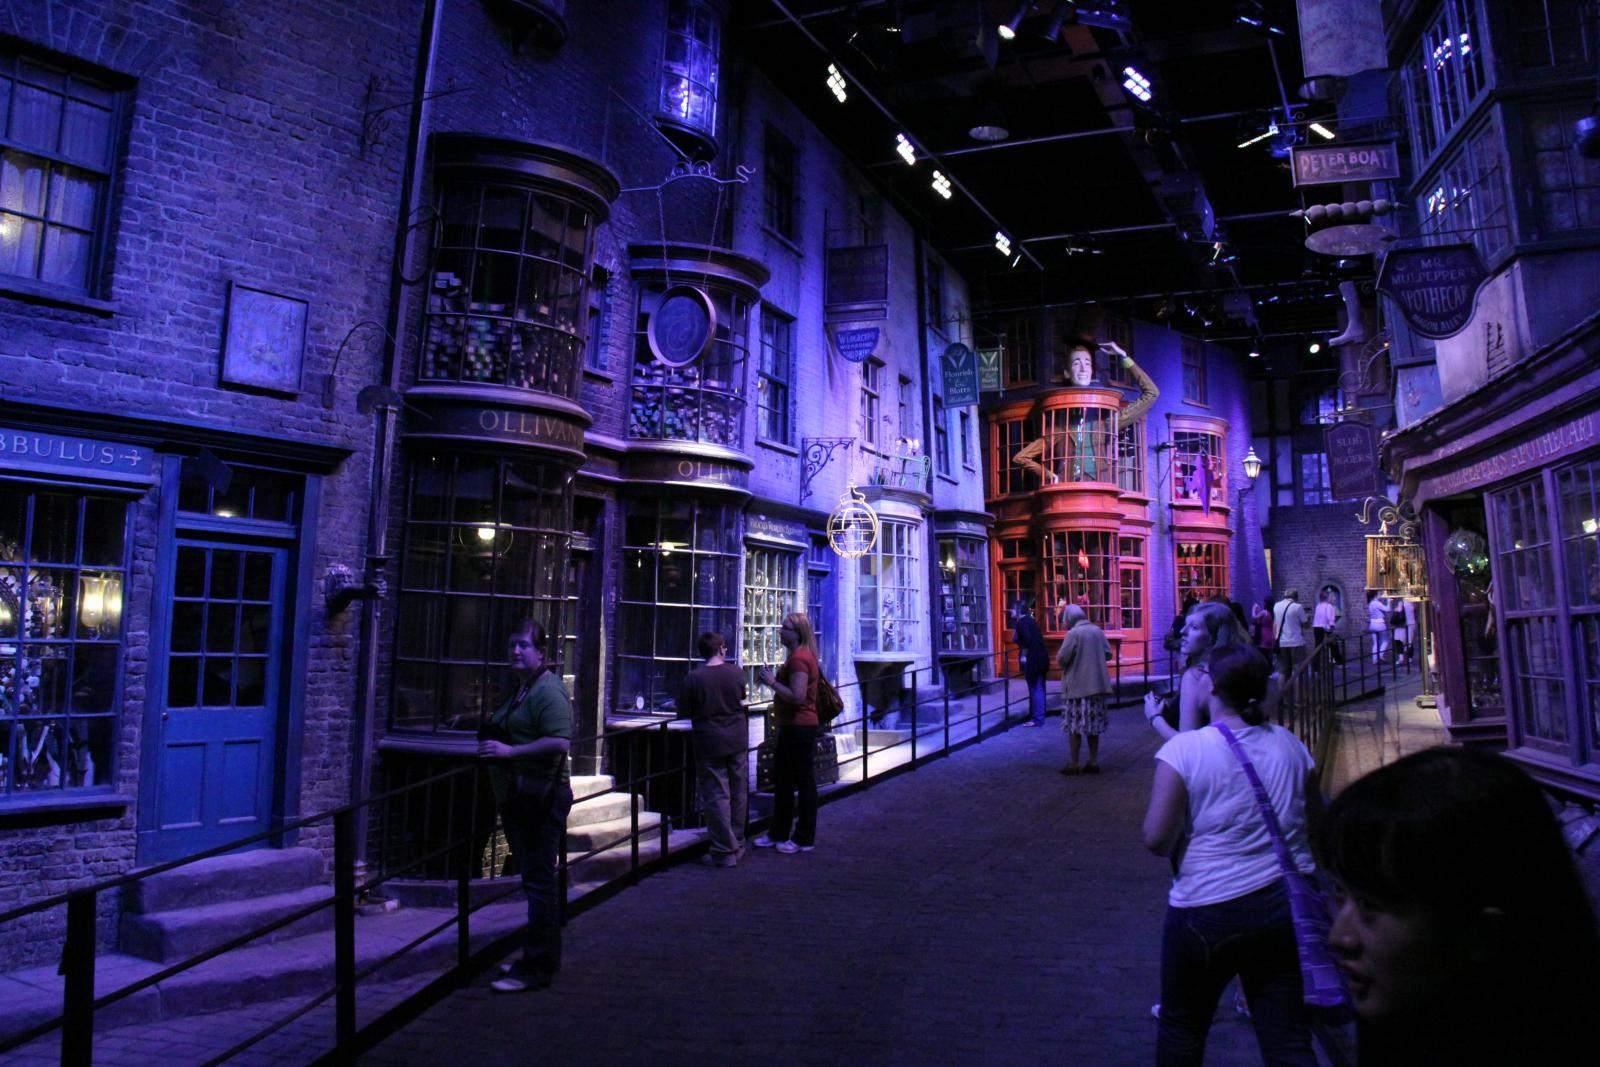 making harry potter The Making of Harry Potter, Warner Bros Studio London